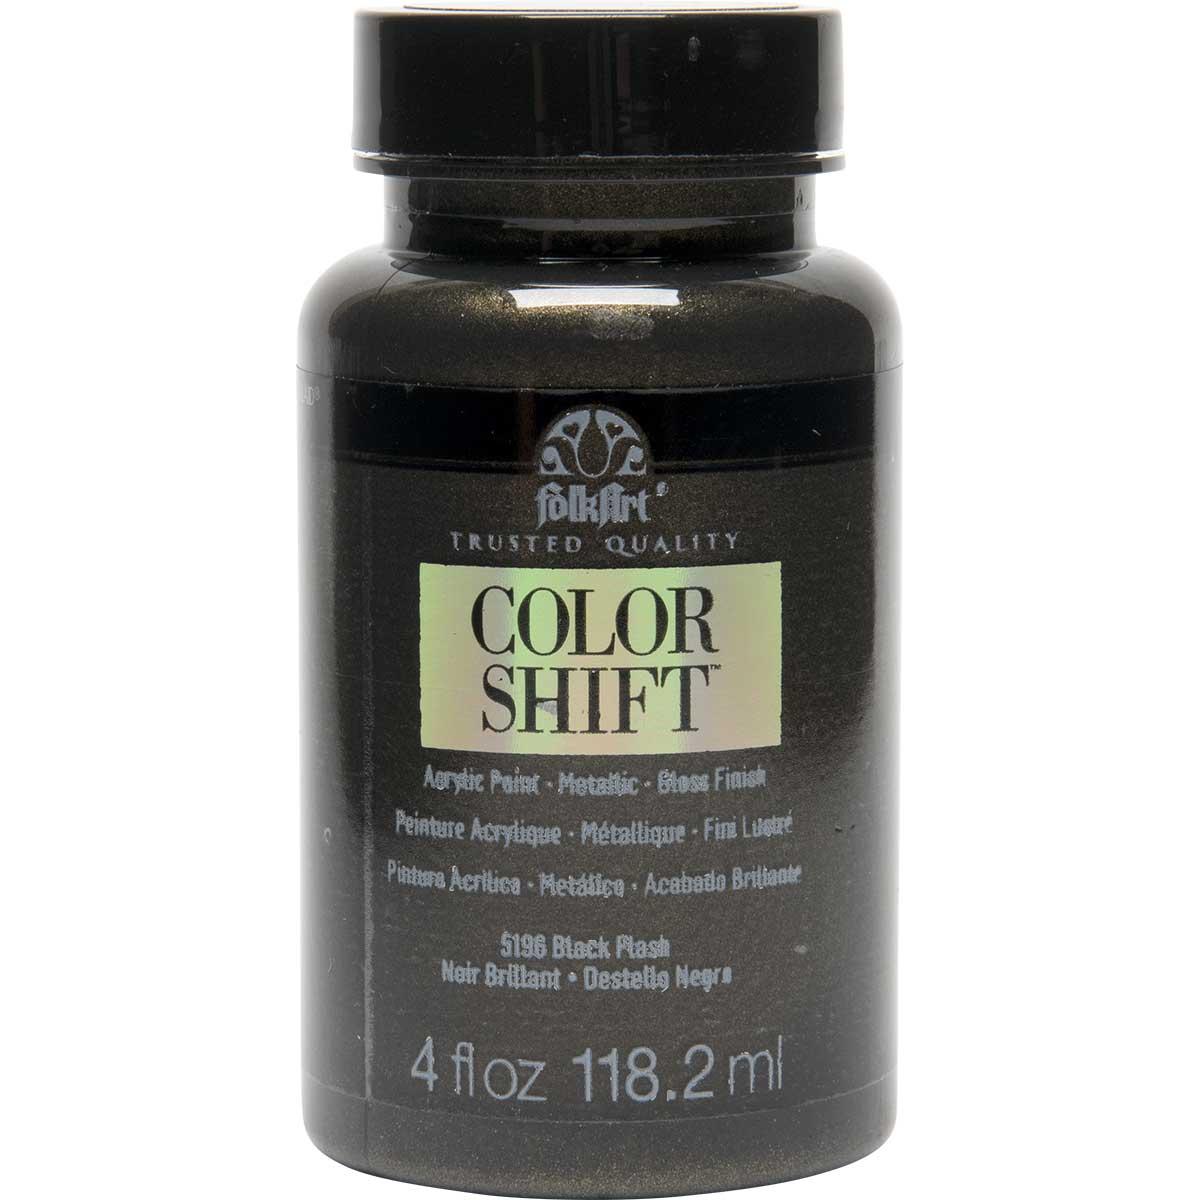 FolkArt ® Color Shift™ Acrylic Paint - Black Flash, 4 oz. - 5196